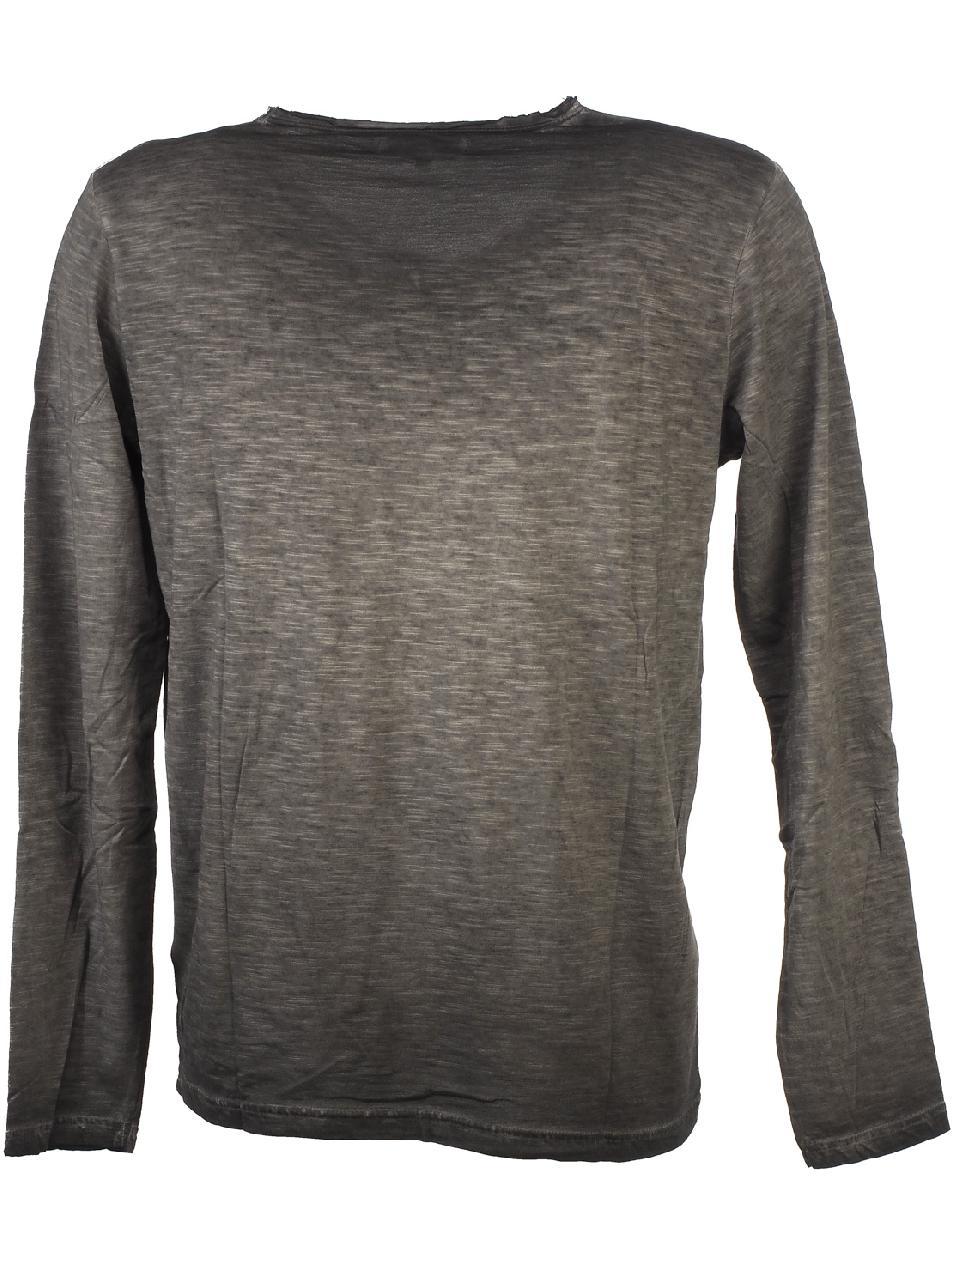 T-Shirt-Long-Sleeves-Biaggio-Lydil-Dk-Grey-ML-Tee-Grey-51660-New thumbnail 4